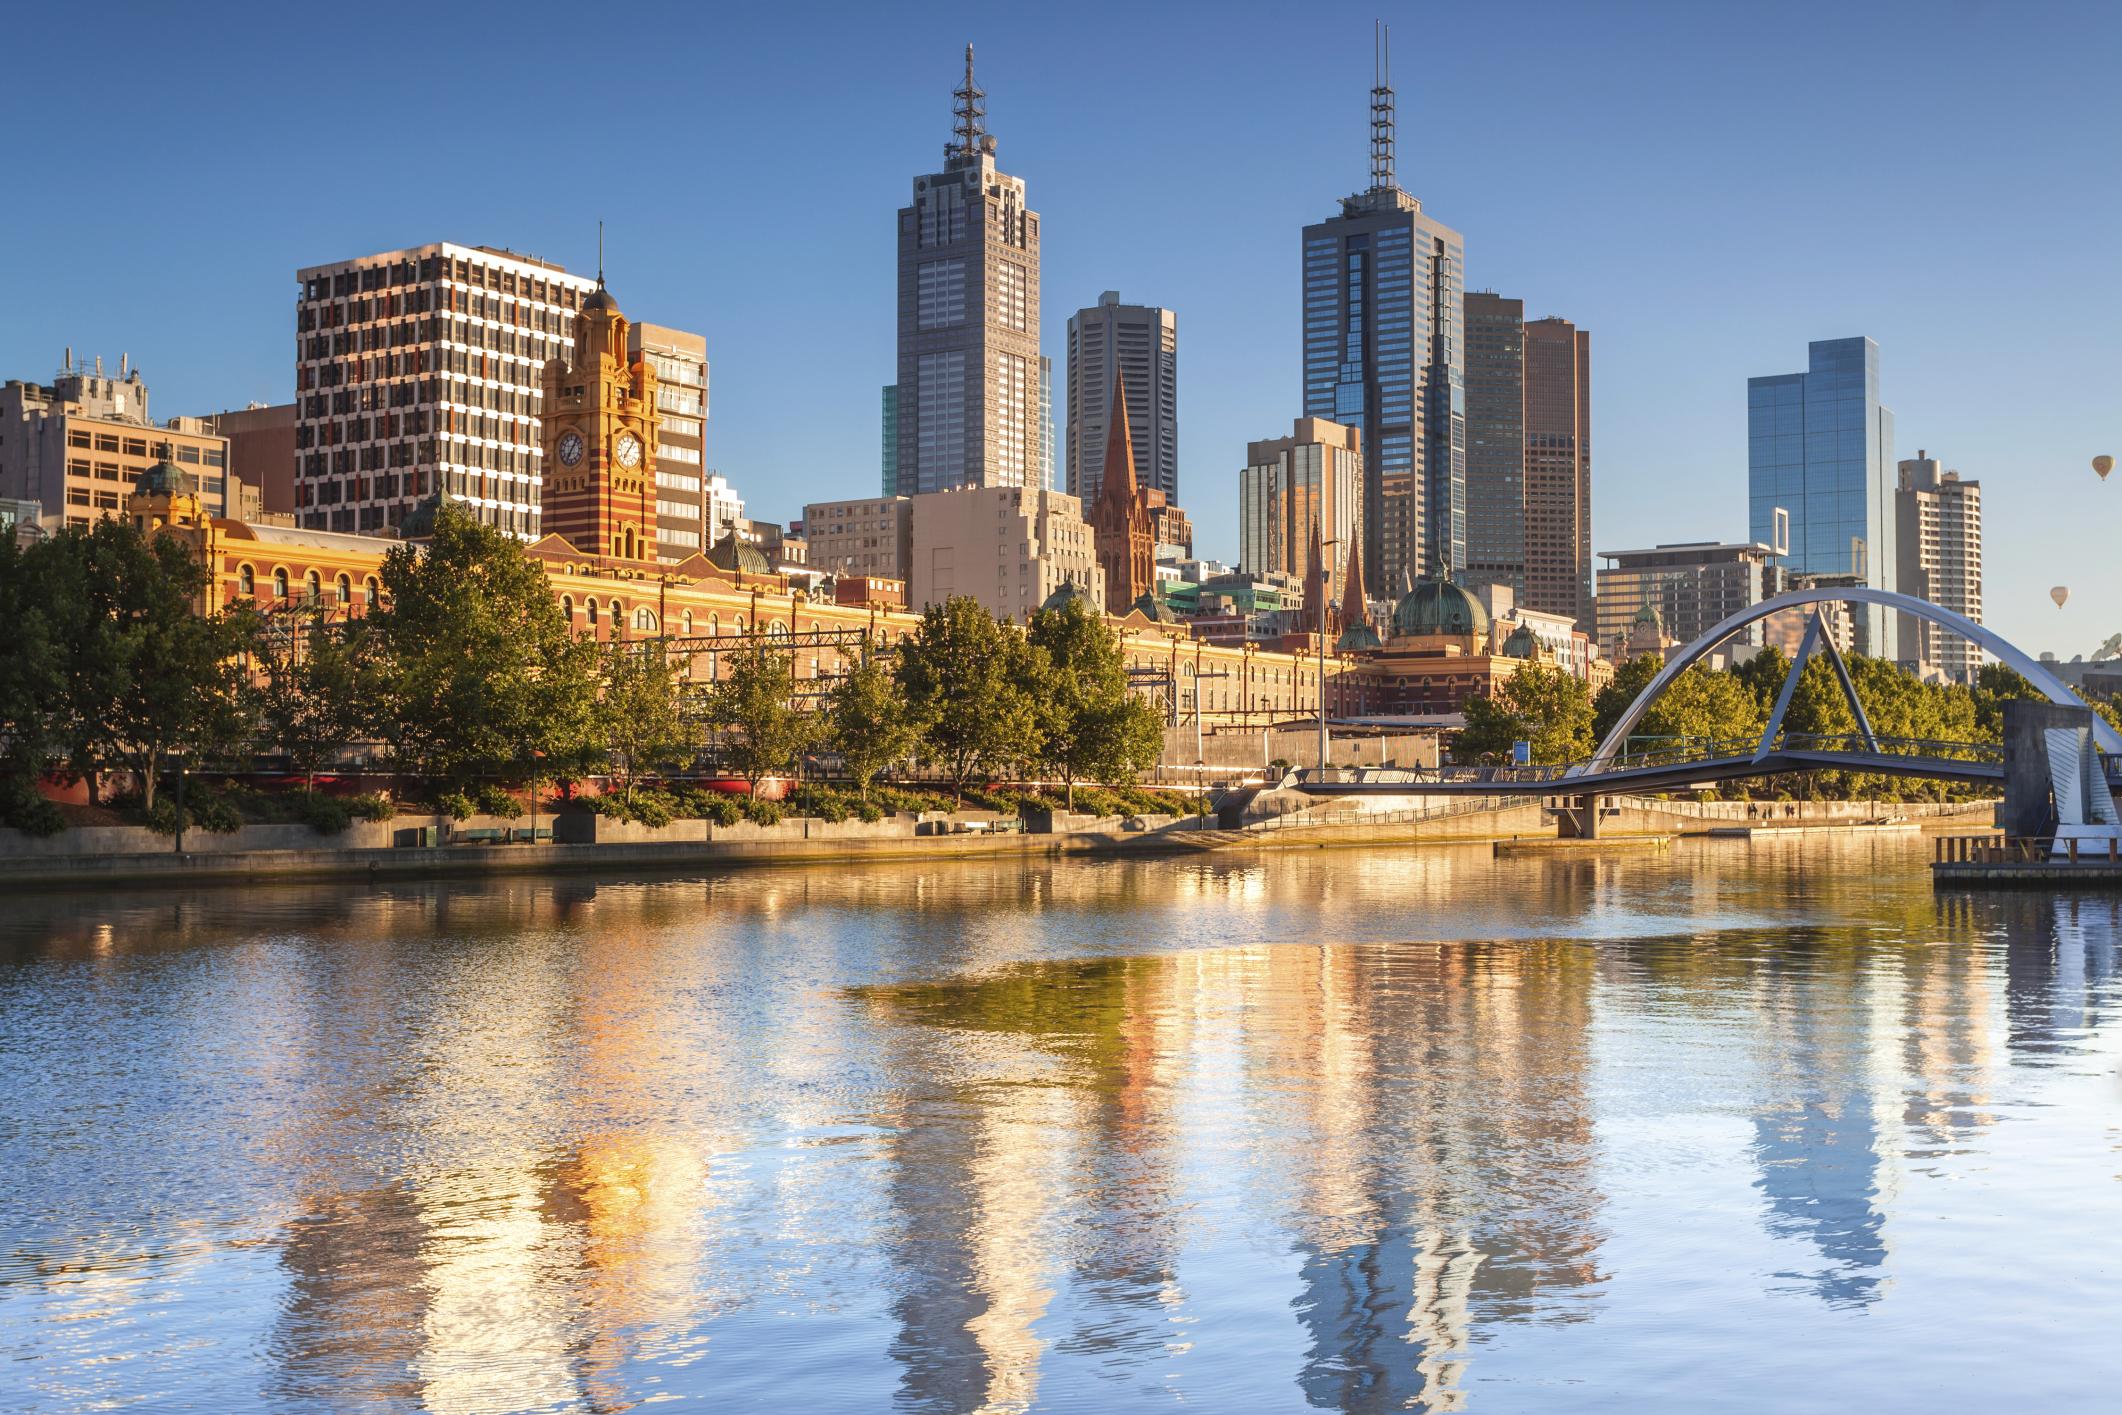 incontri gratuiti Melbourne Hook Up evento c#